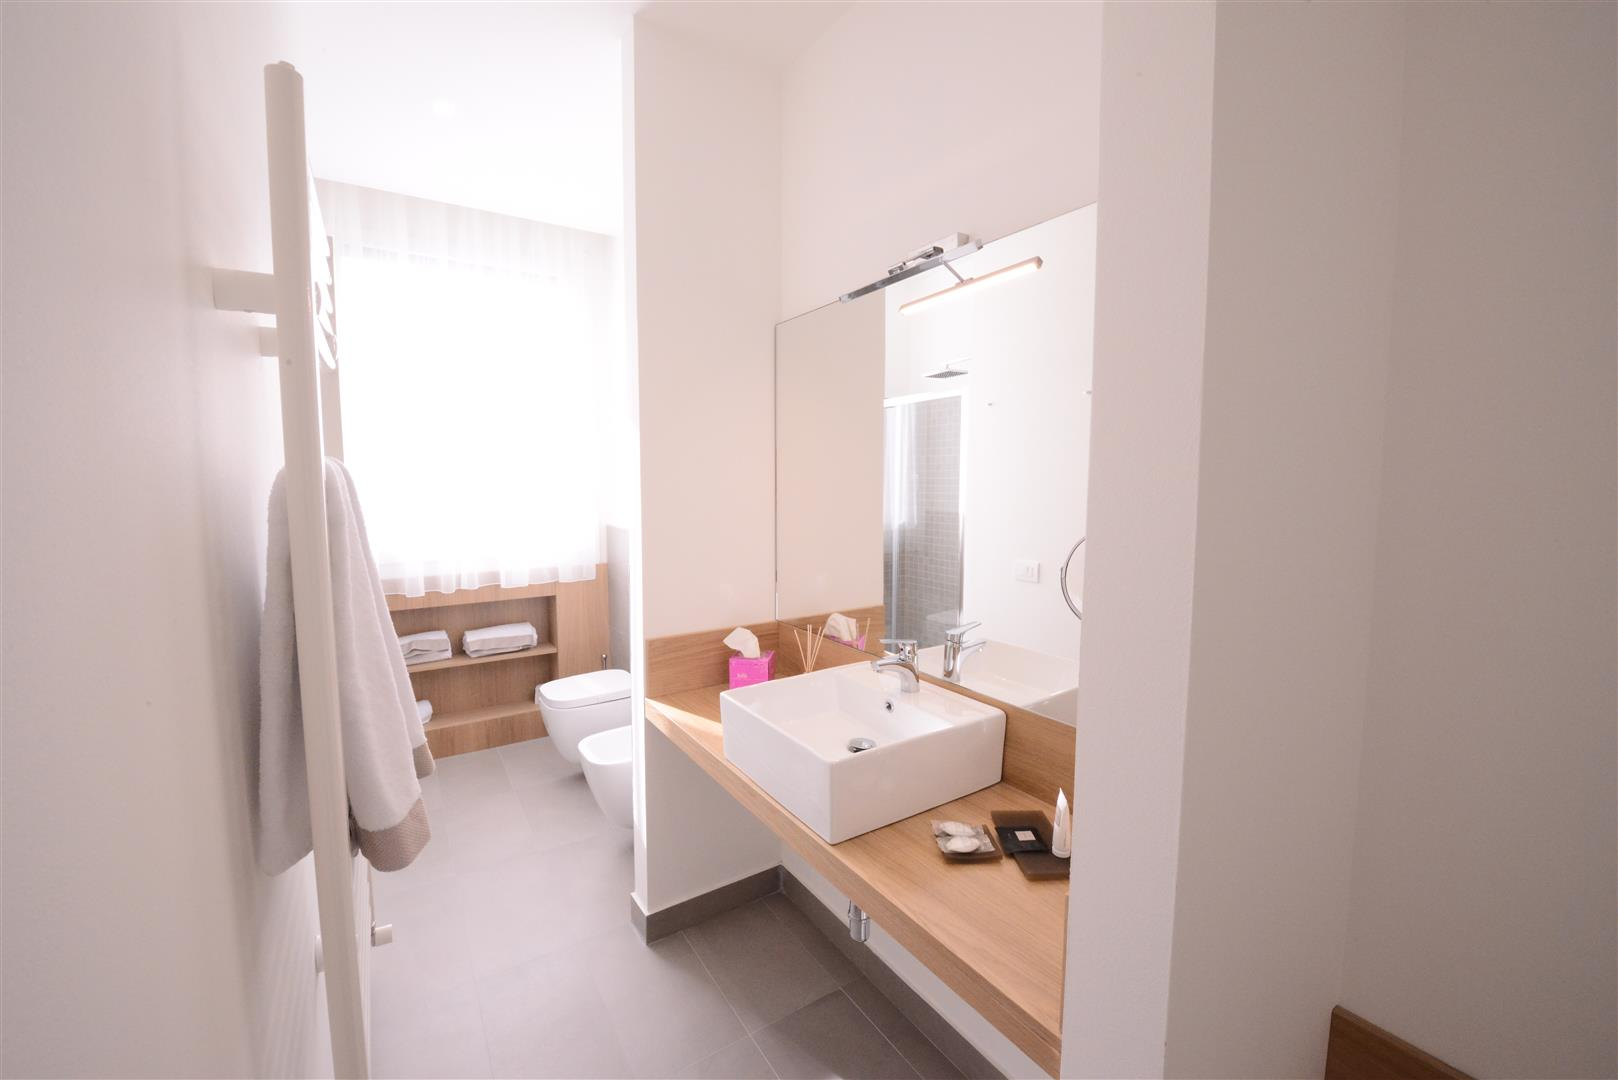 Suites  Sicilia Hotel Spa  Bagno in camera WiFi Aria